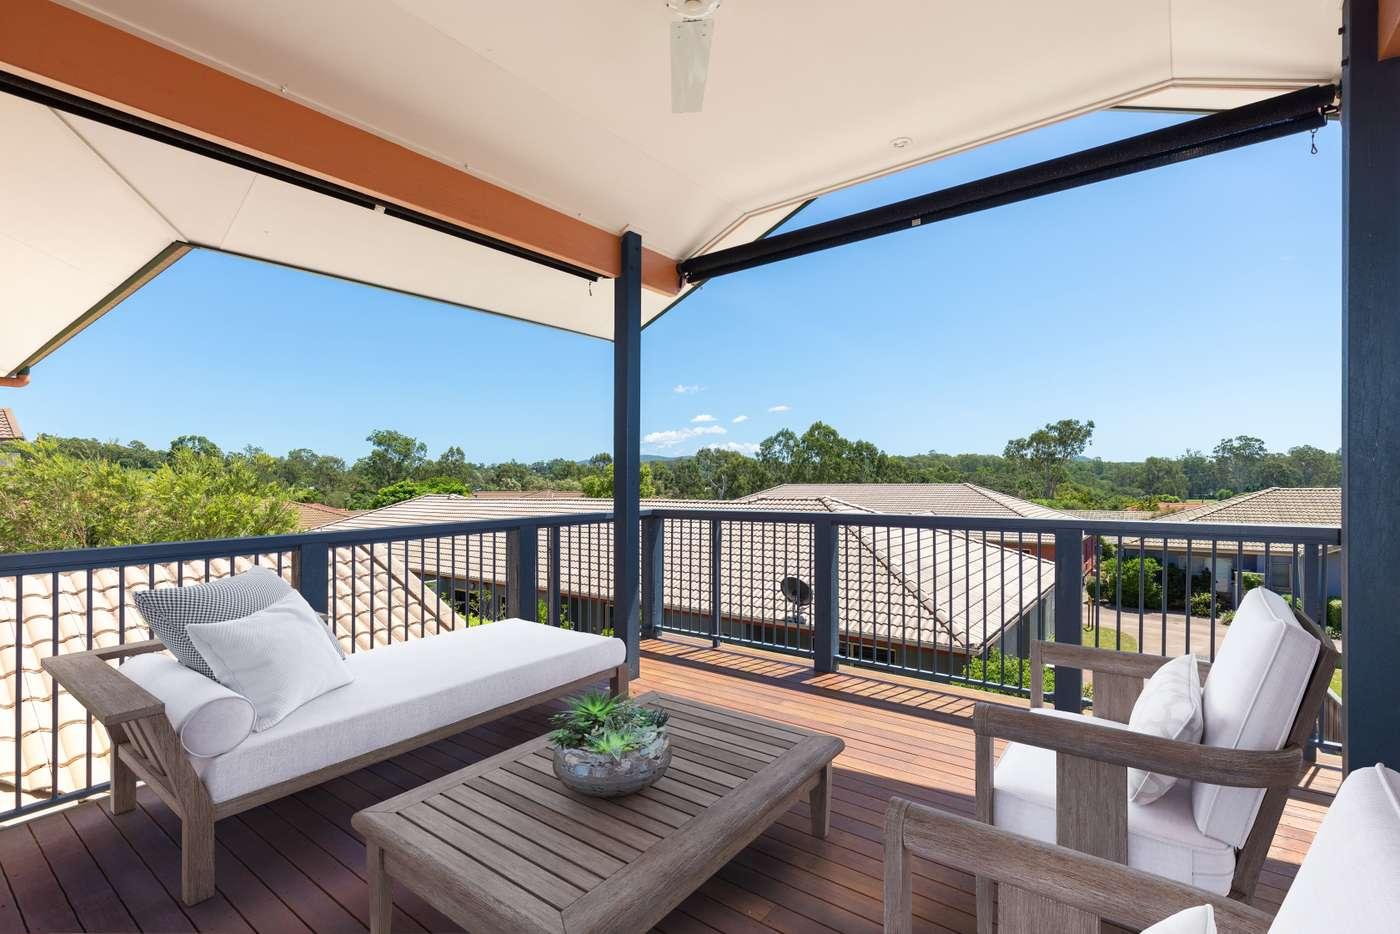 Main view of Homely villa listing, 14/119 Sugarwood Street, Moggill QLD 4070